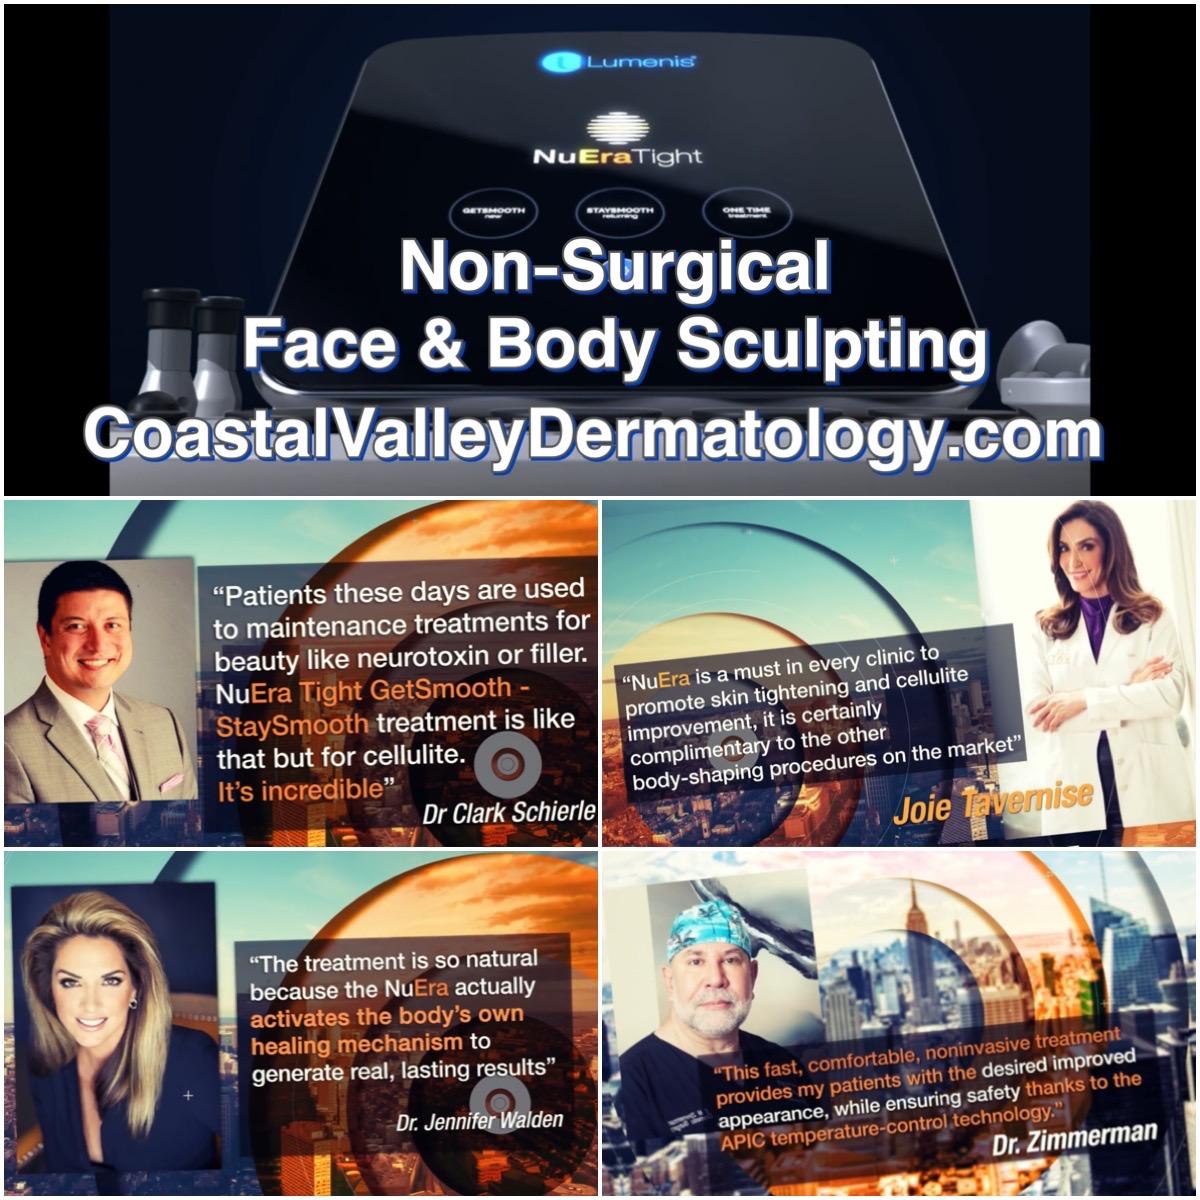 coastal-valley-dermatology-monterey-nuera-tight-skin-quotes-doctors